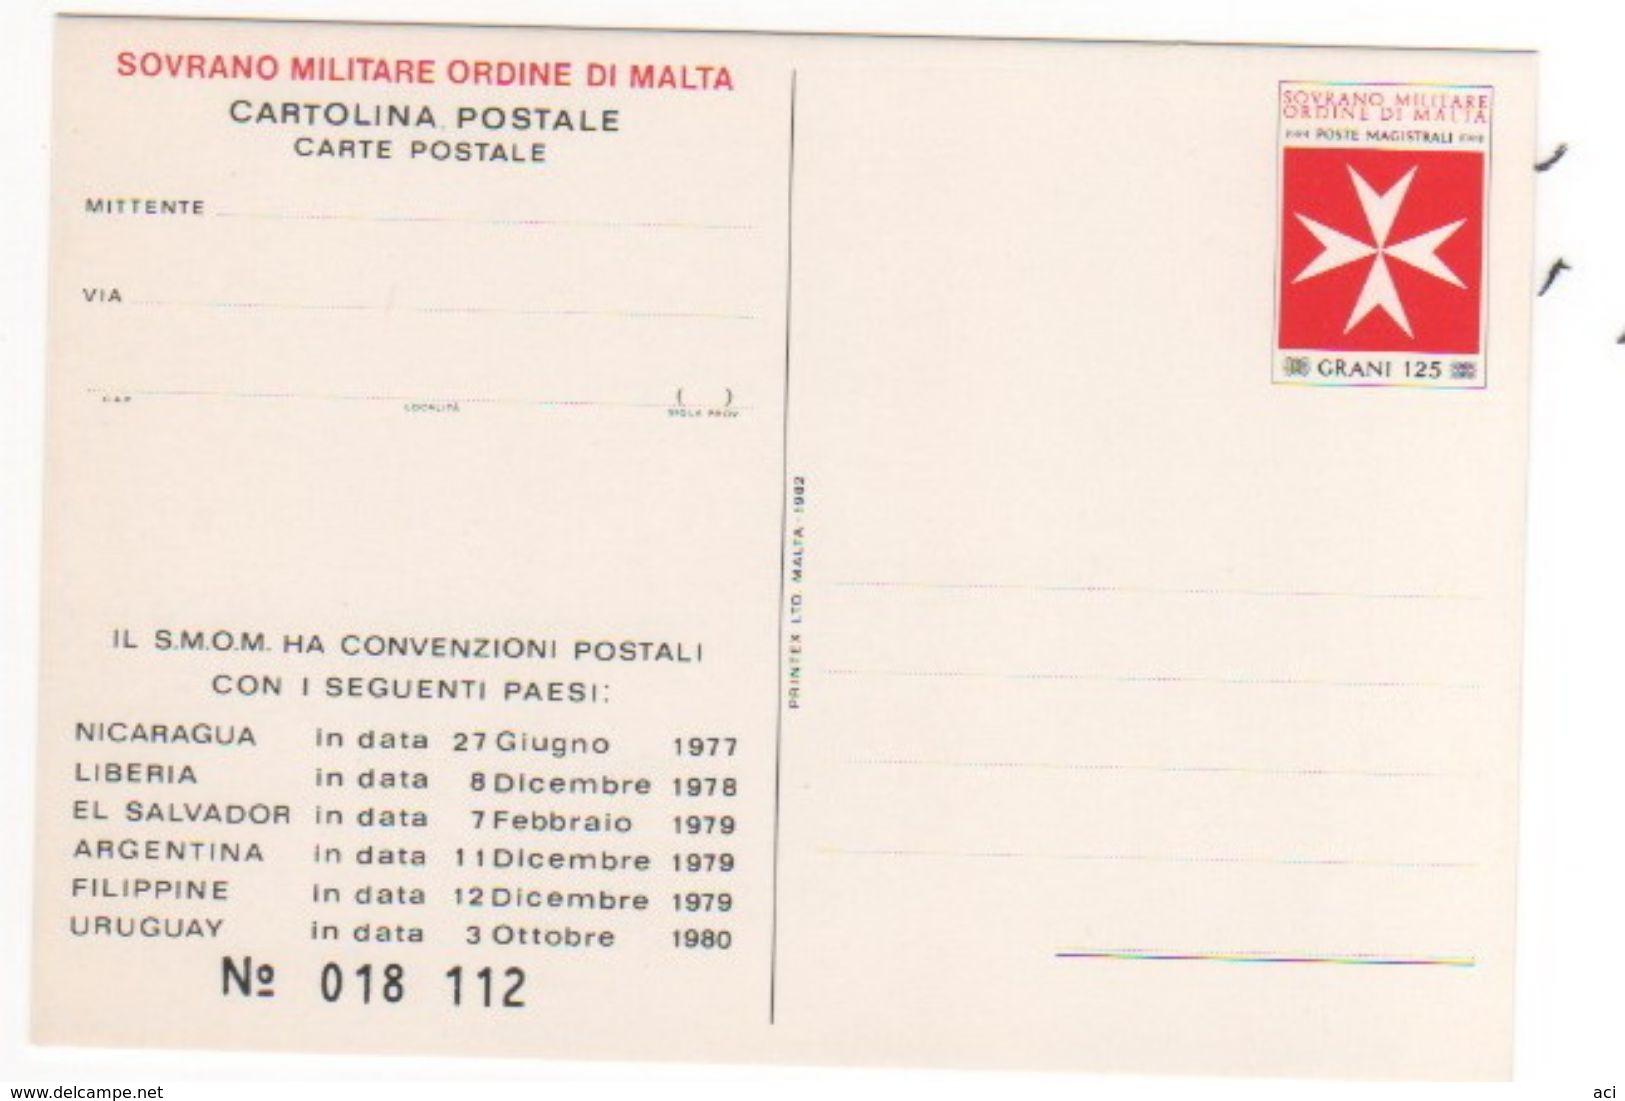 Sovrano Military Order Of Malta 125 Gr Mint Postal Card - Malte (Ordre De)